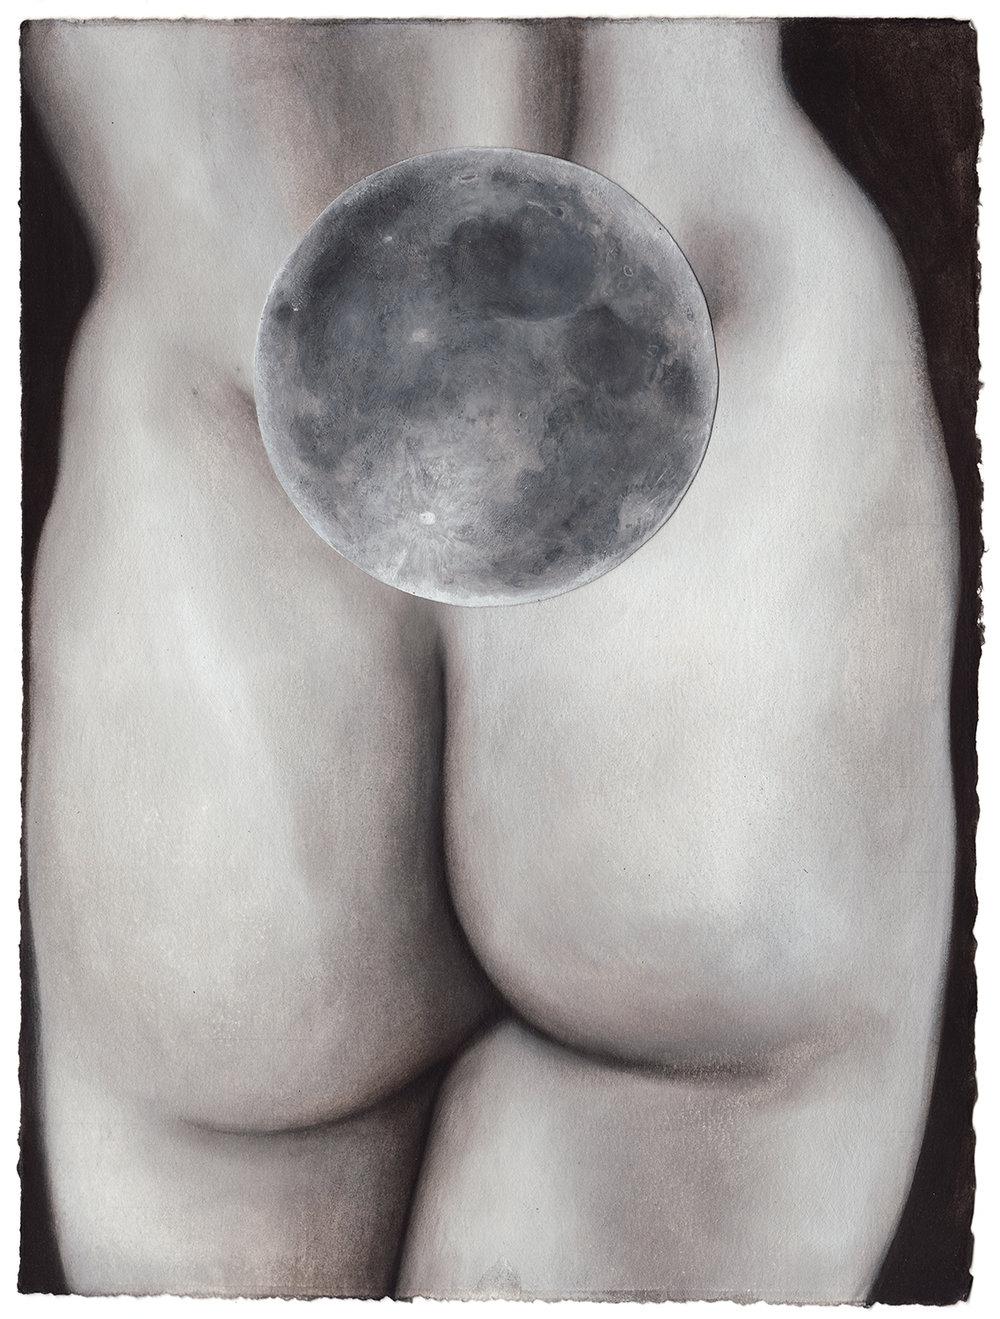 Venus No. 5: Full Moon Venus